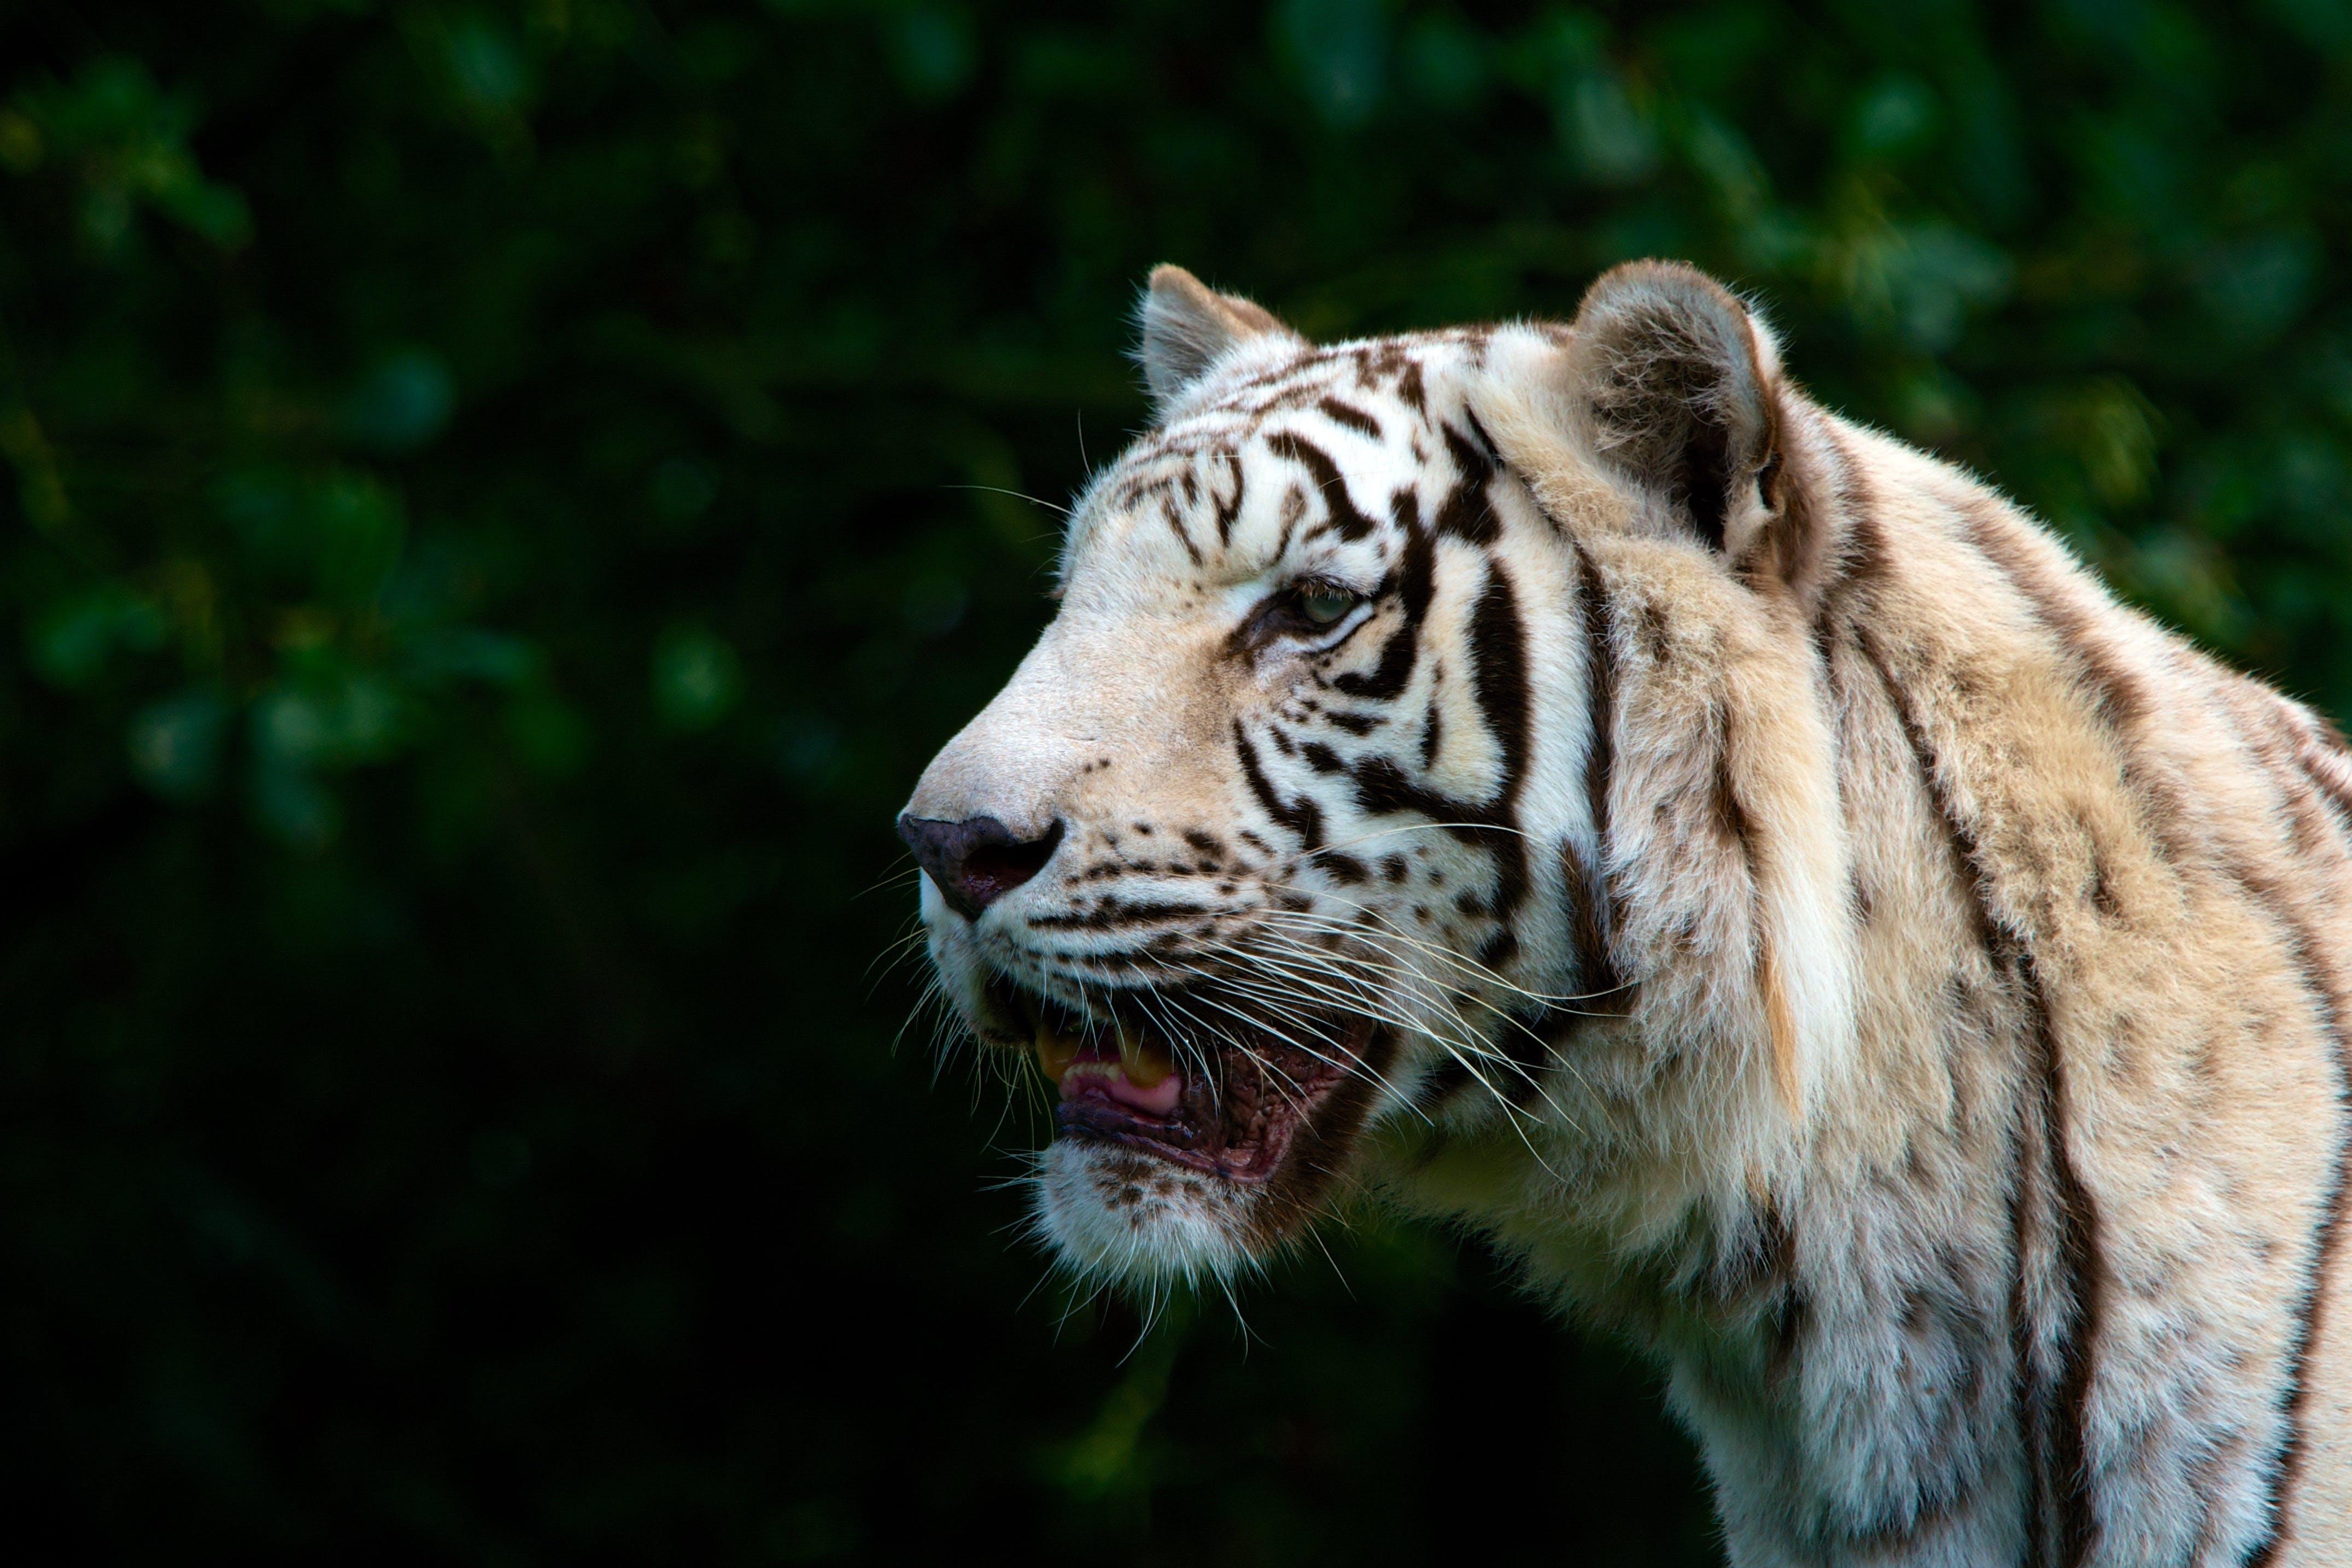 Tiger Near Trees